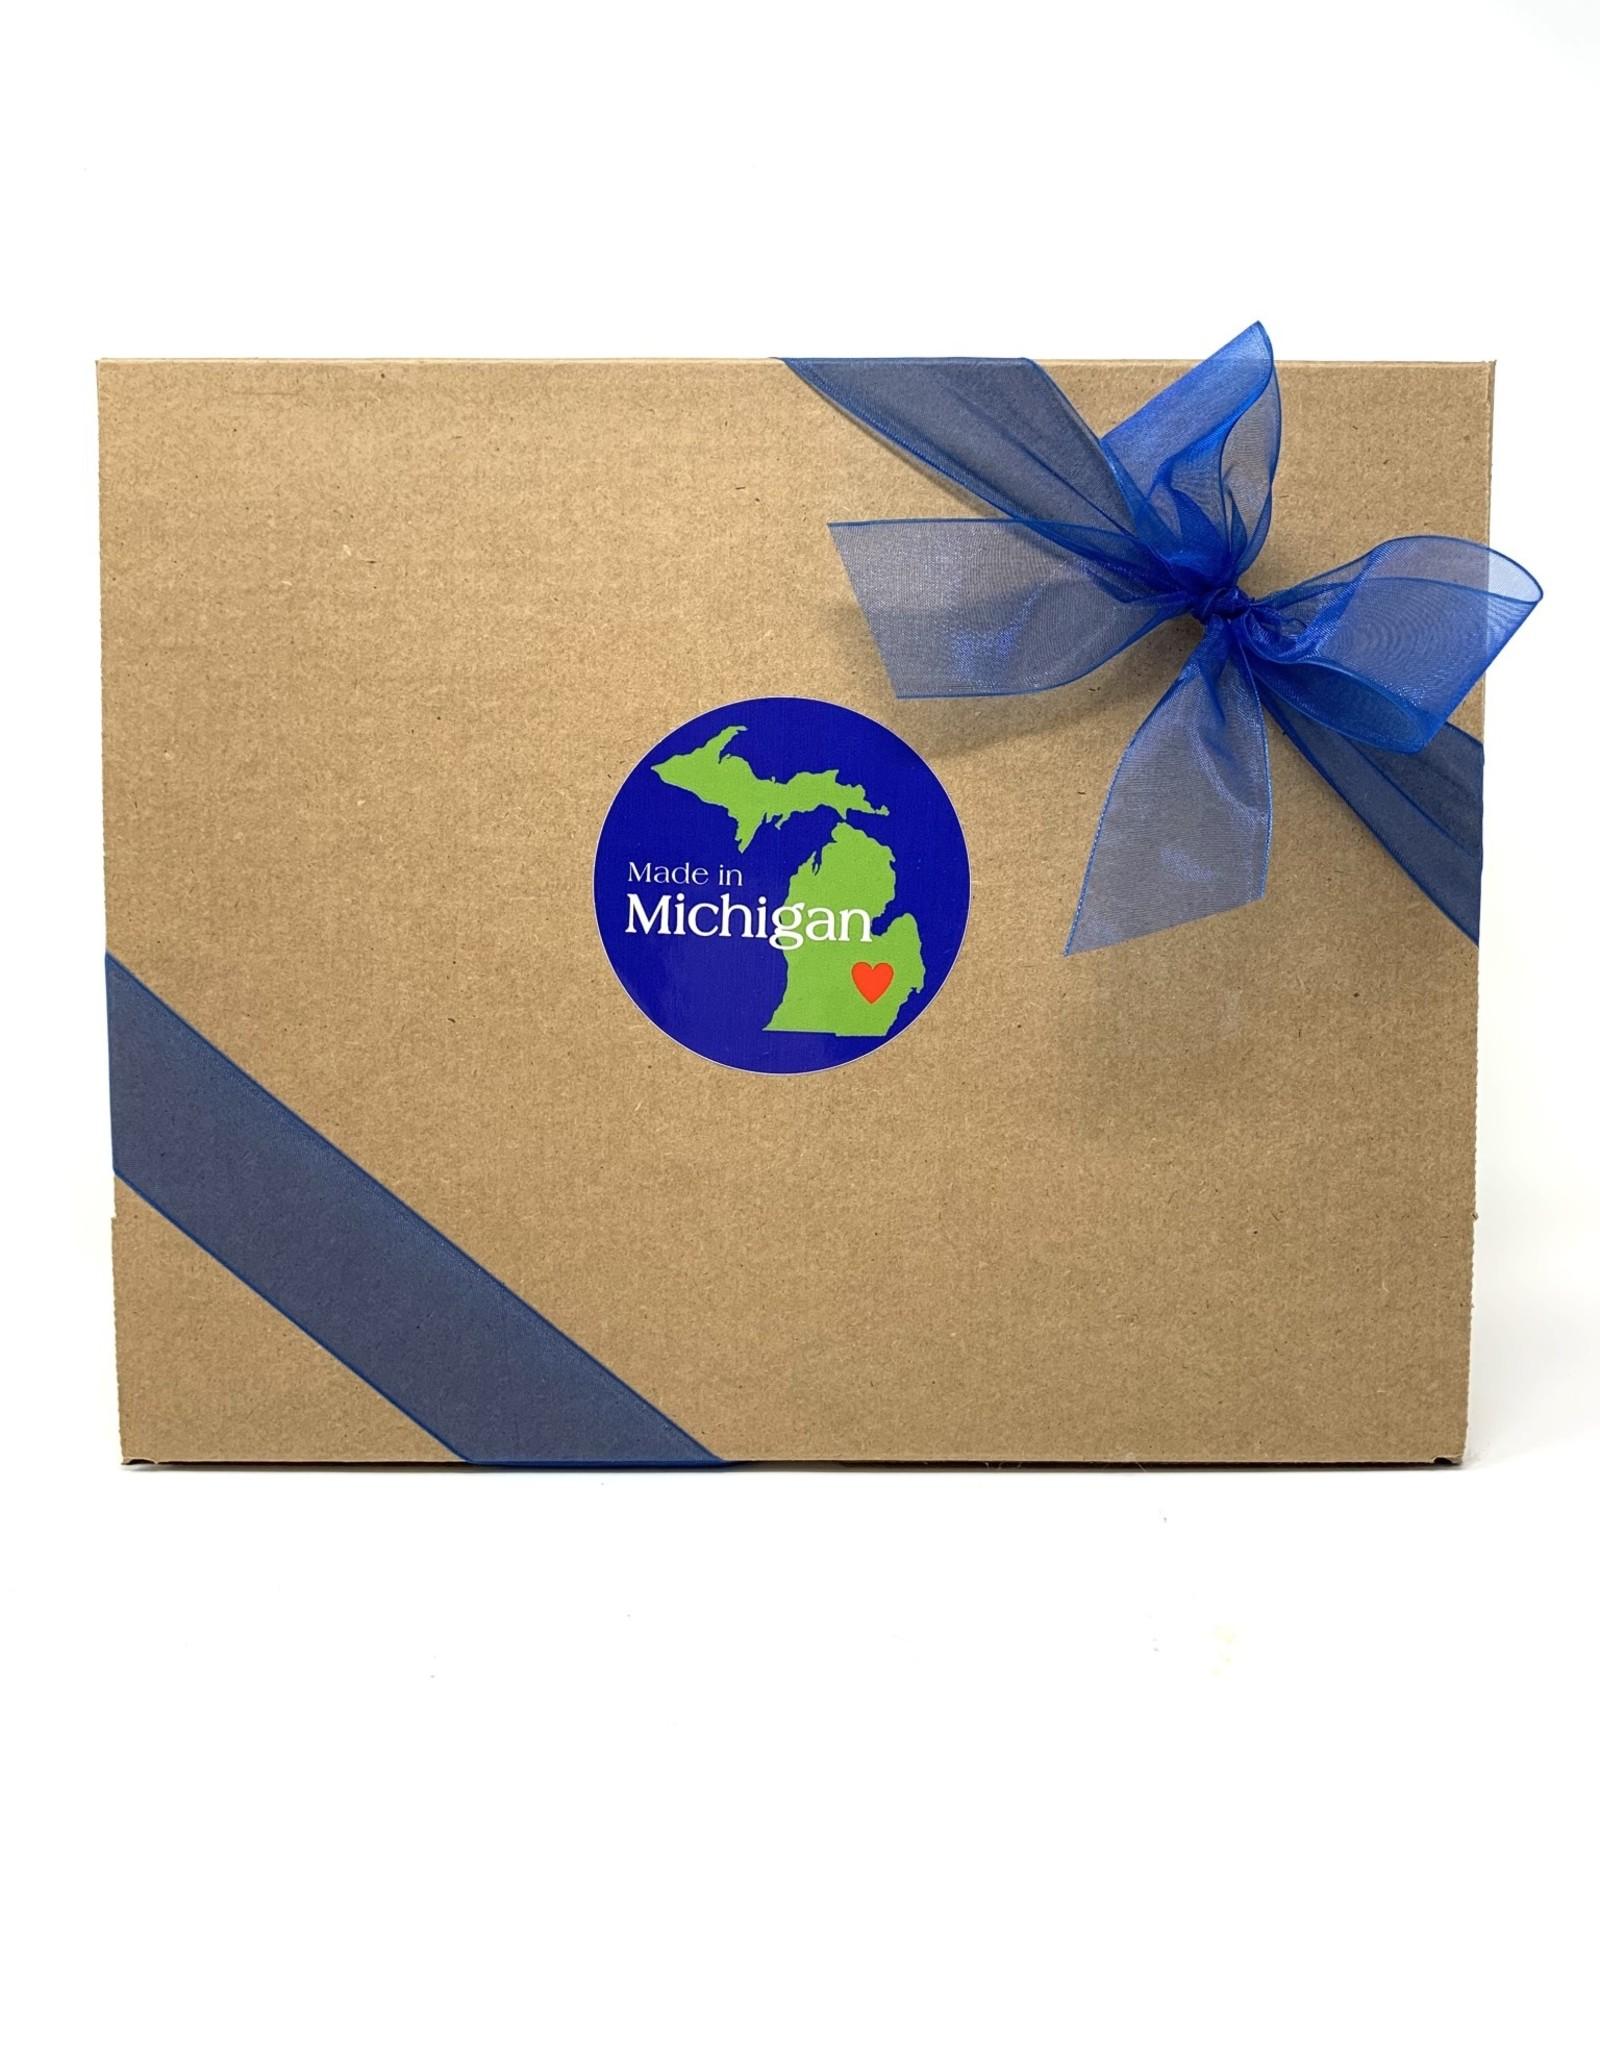 Michigan Box 2020 $50